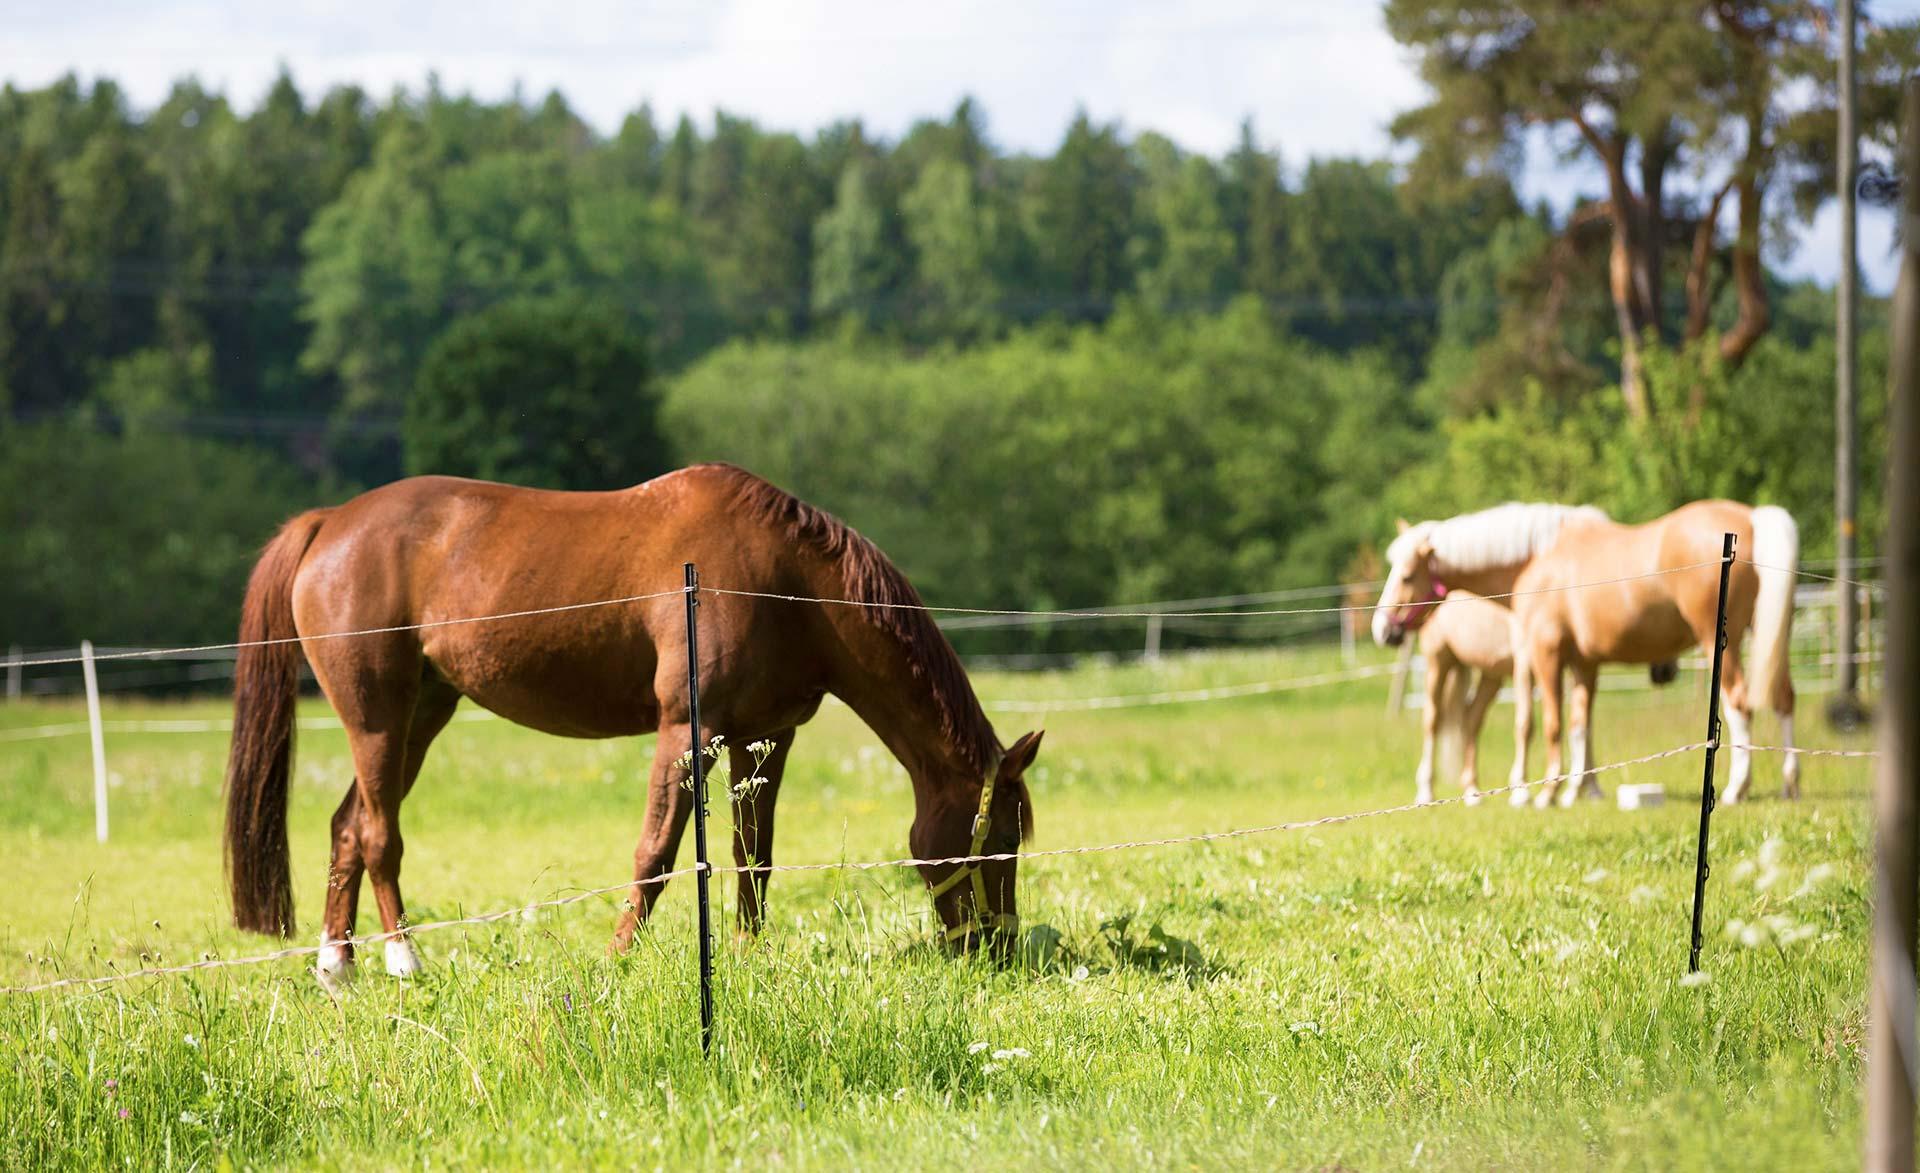 pinsiön ratsastuskoulu